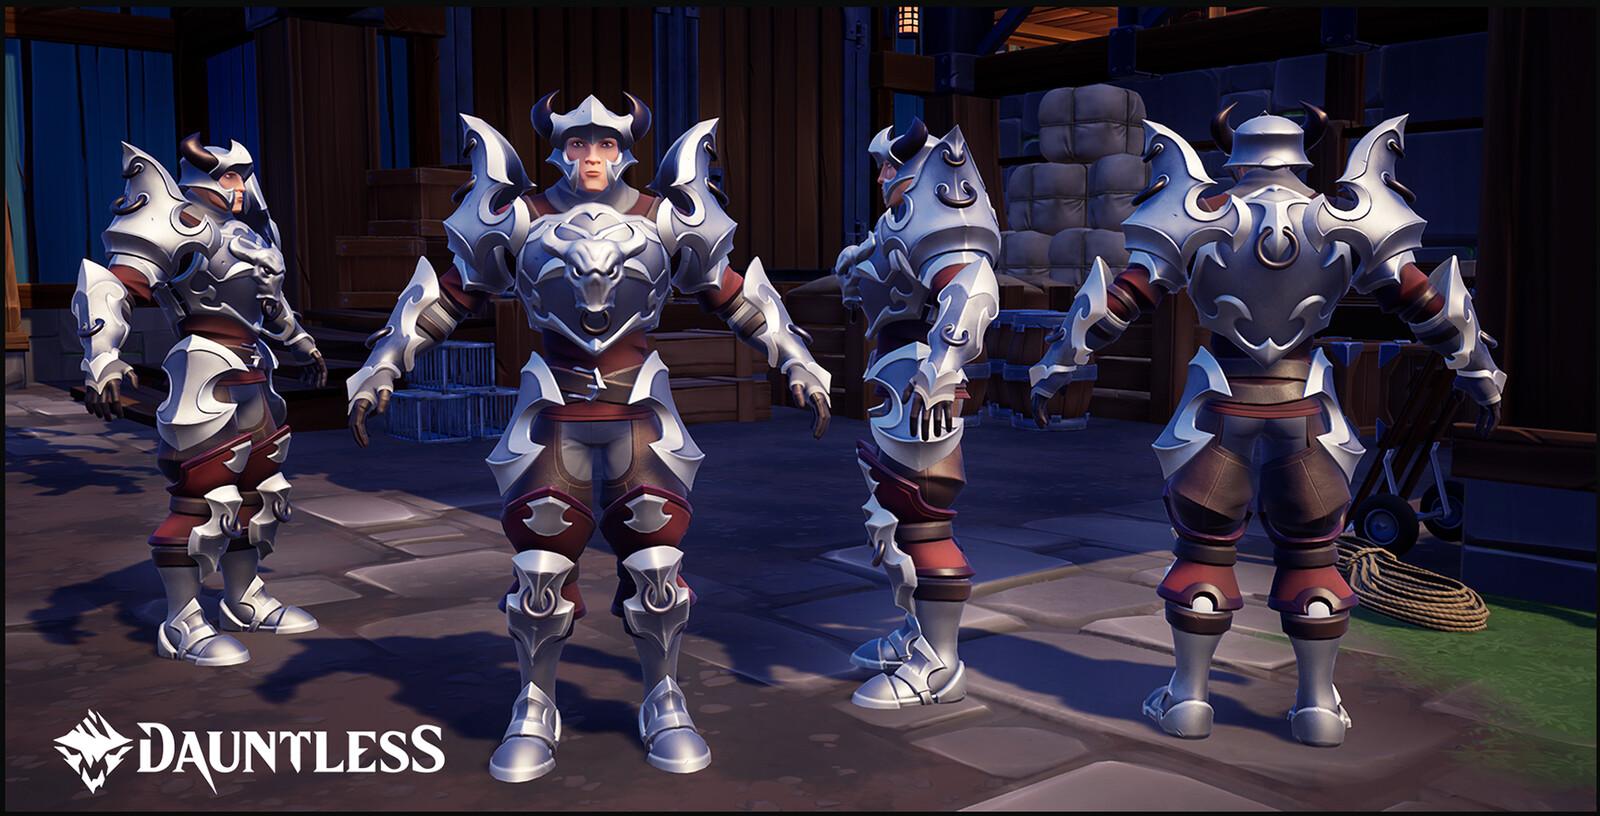 Heroic Armor. LVL 1 Hunt Pass reward for the season of Myth and Legend.